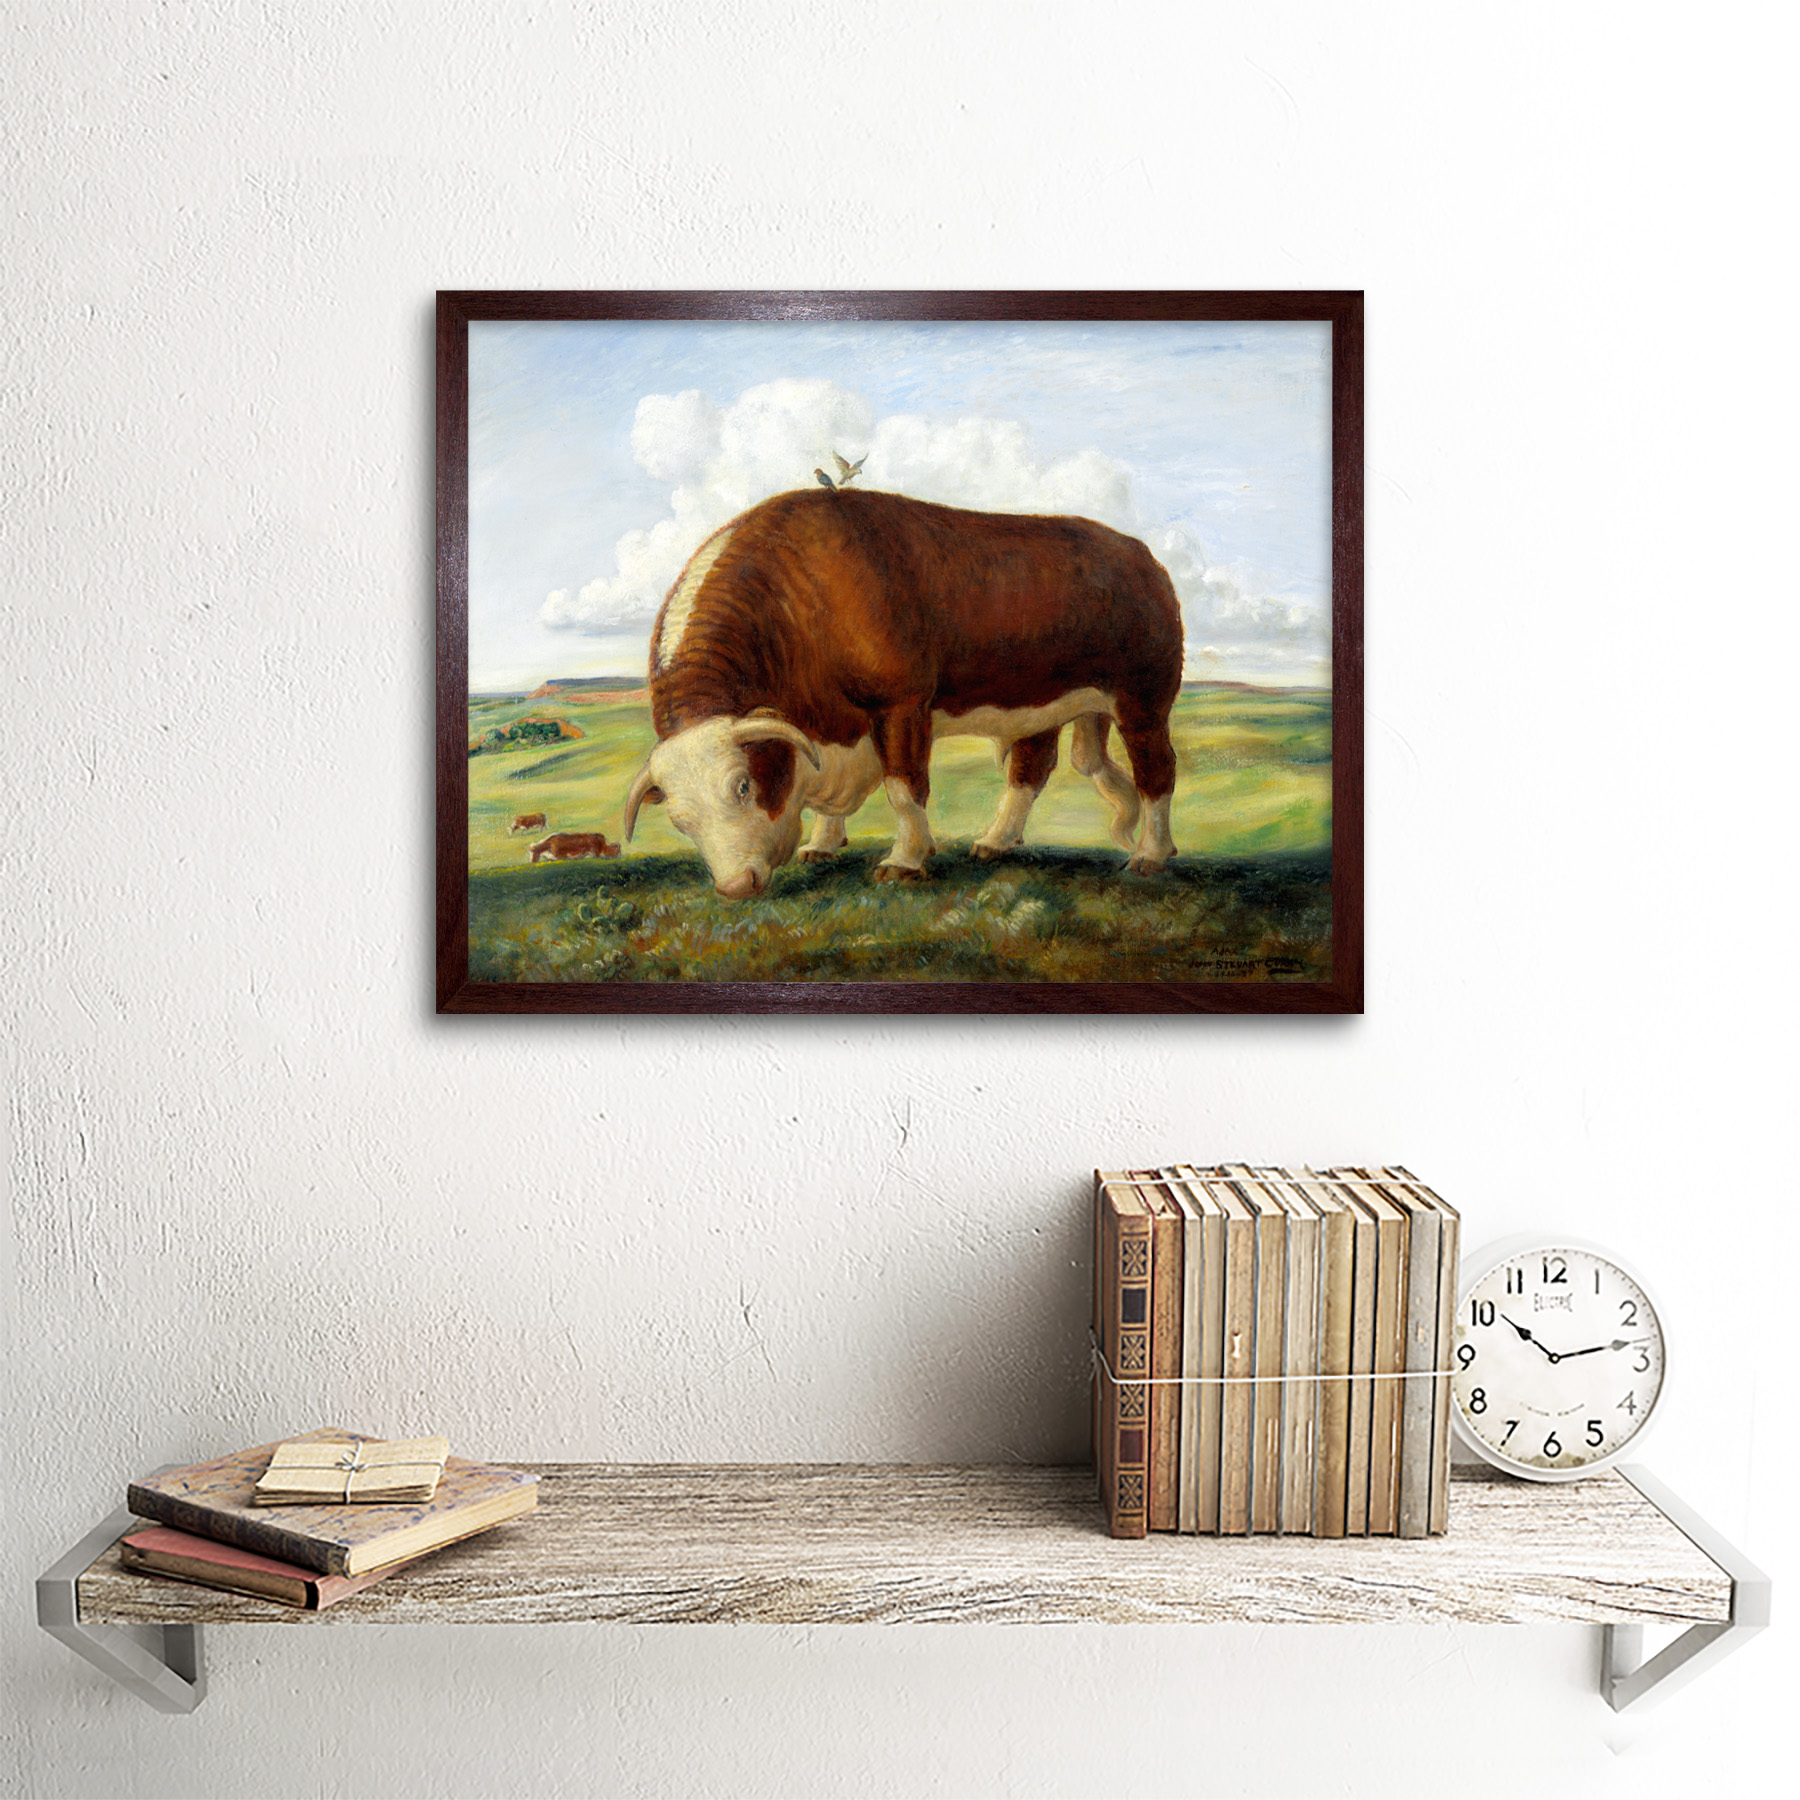 Curry Ajax Hereford Vaca Toro Aves Paisaje Pintura arte impresión enmarcado 12x16